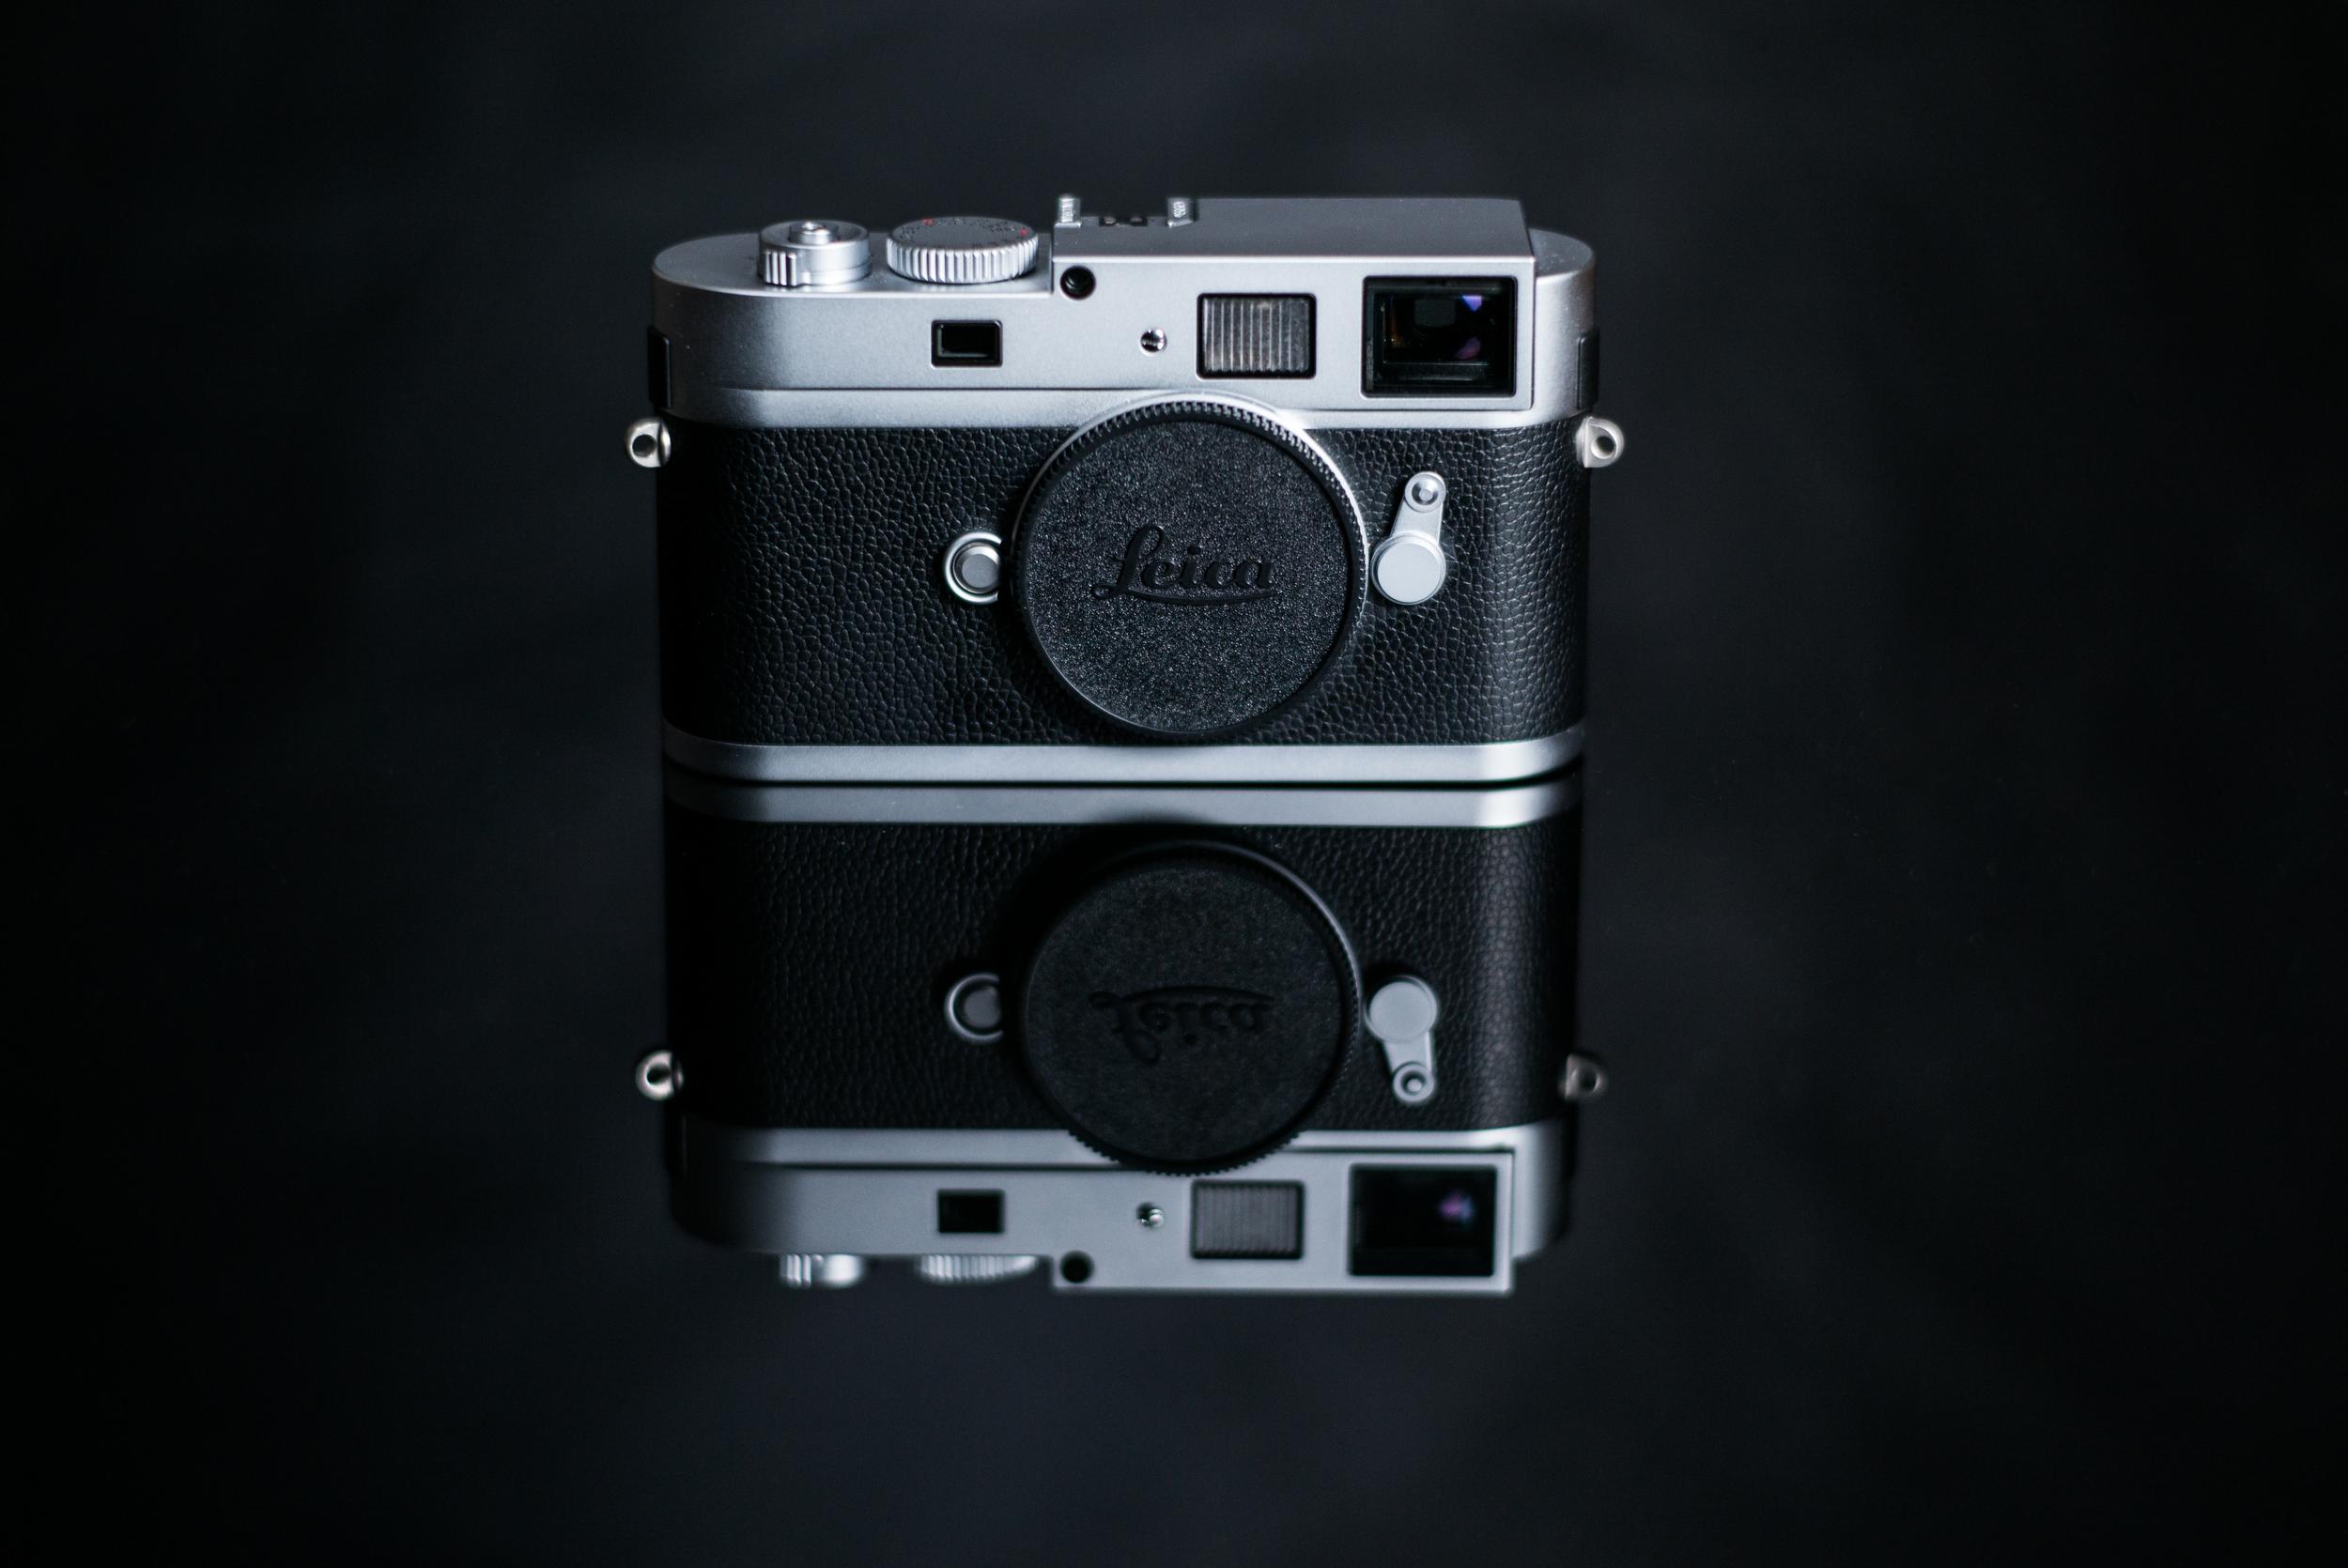 Leica M10 Camera, Understanding Image Sensor Technology, Leica m10 camera review, leica cos sensor